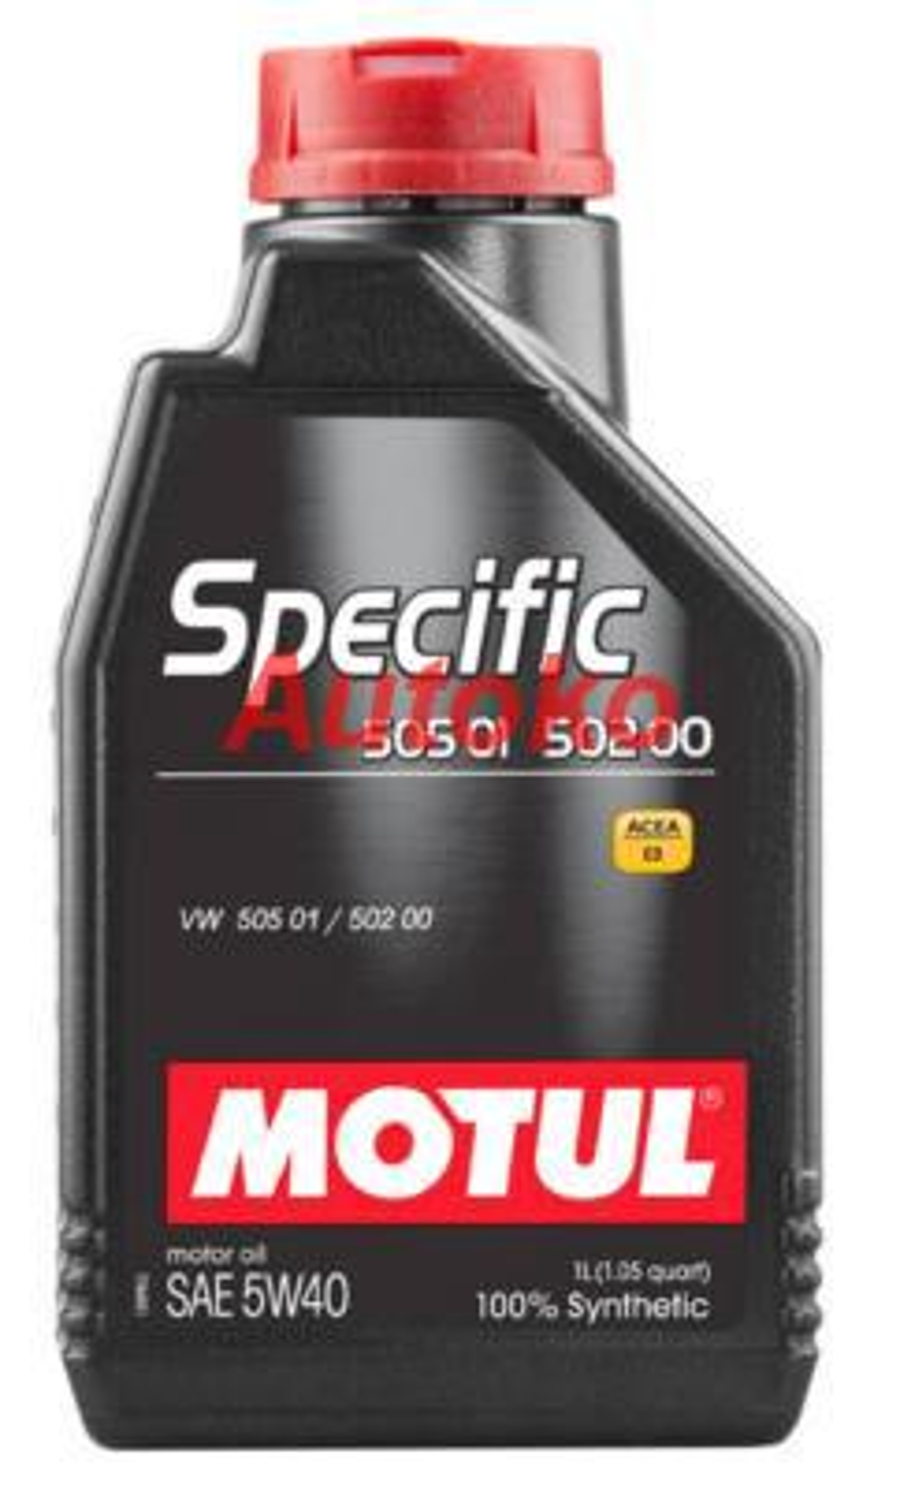 Масло моторное синтетическое Specific VW502,00-505,00-505,01 5W-40, 1л